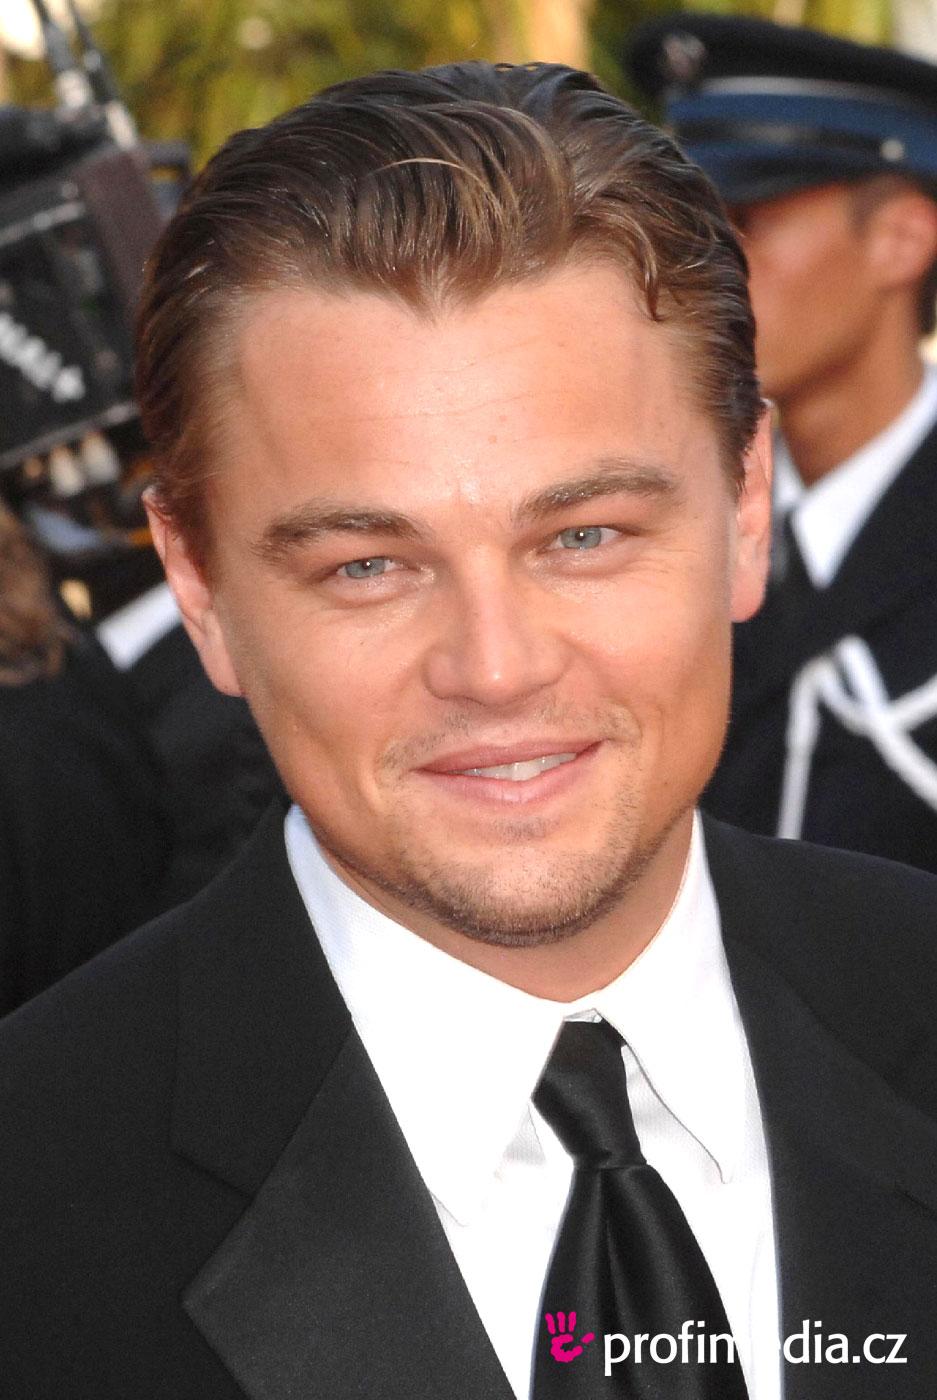 Leonardo Dicaprio Hairstyle Easyhairstyler